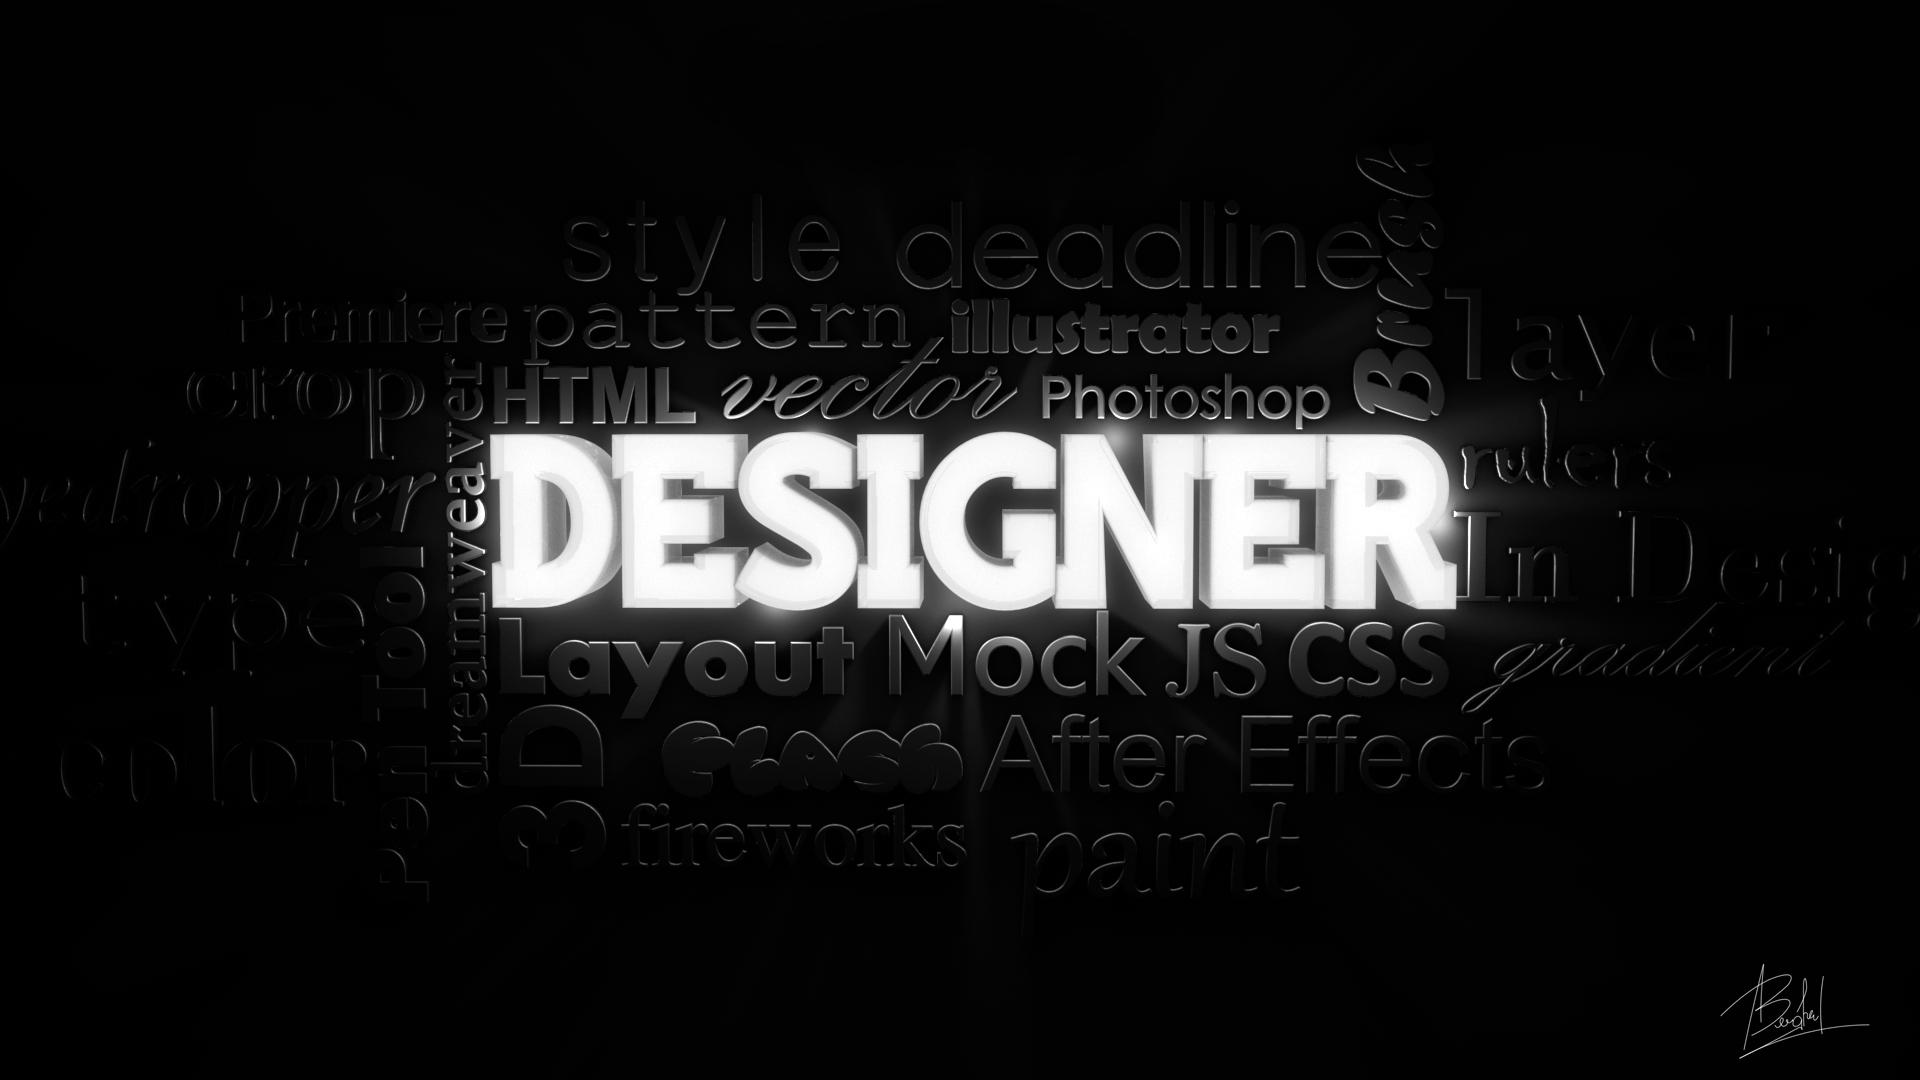 49 Game Developer Wallpaper On Wallpapersafari